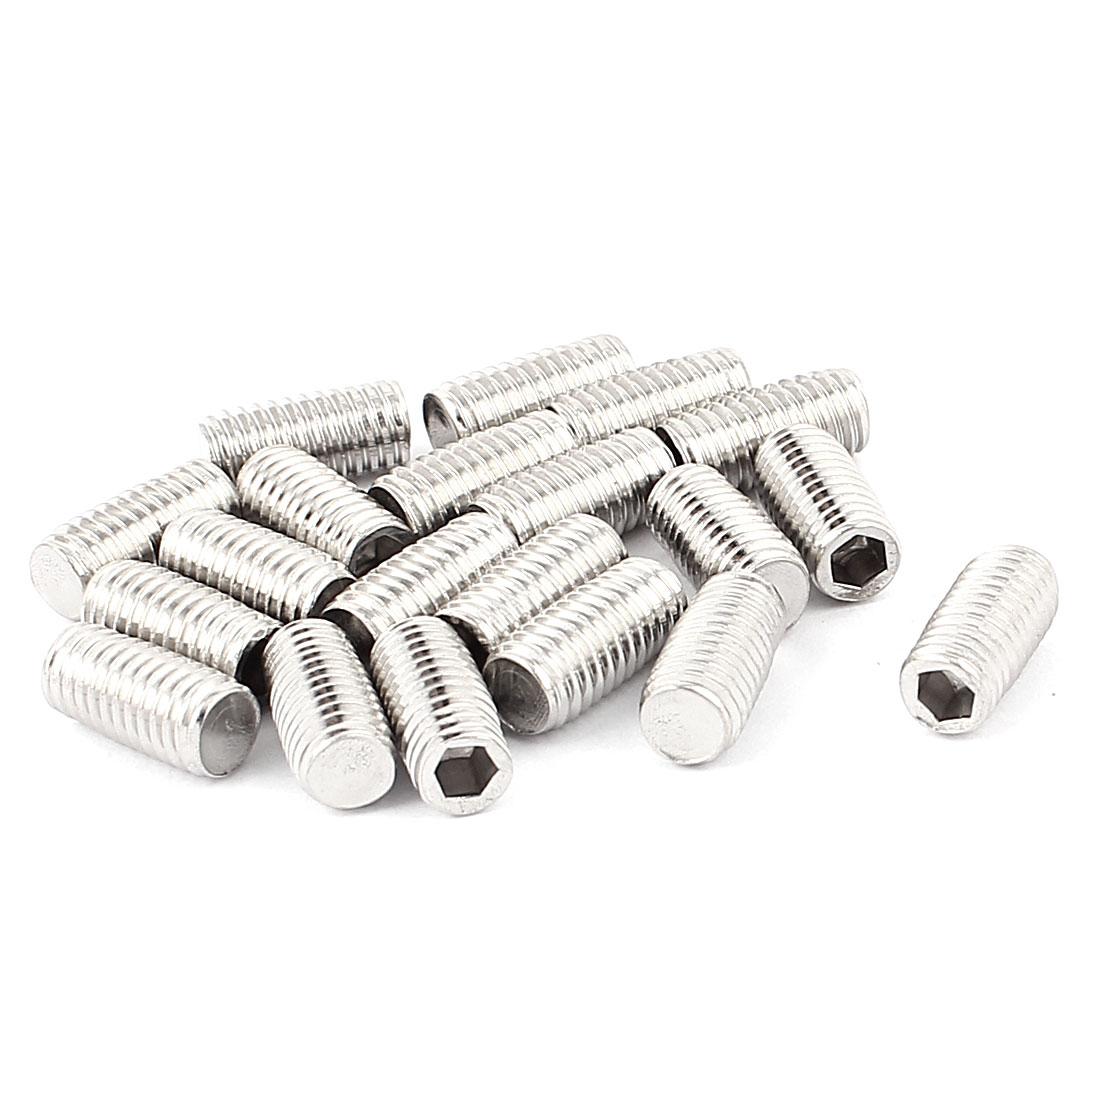 M8x16mm Stainless Steel Hex Socket Grub Screws Fastener Nuts 20pcs